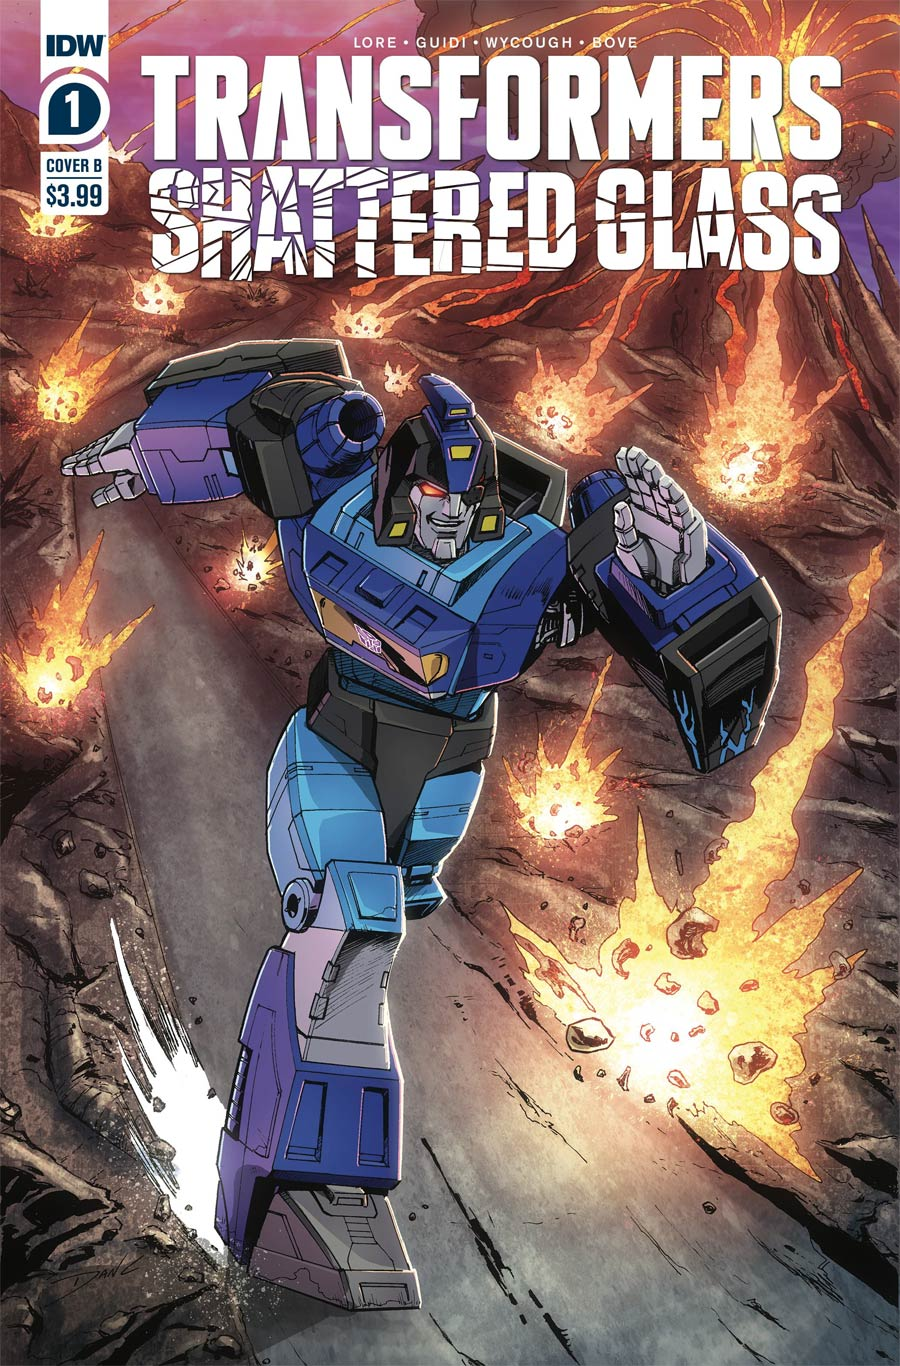 Transformers Shattered Glass #1 Cover B Variant Dan Khanna Cover